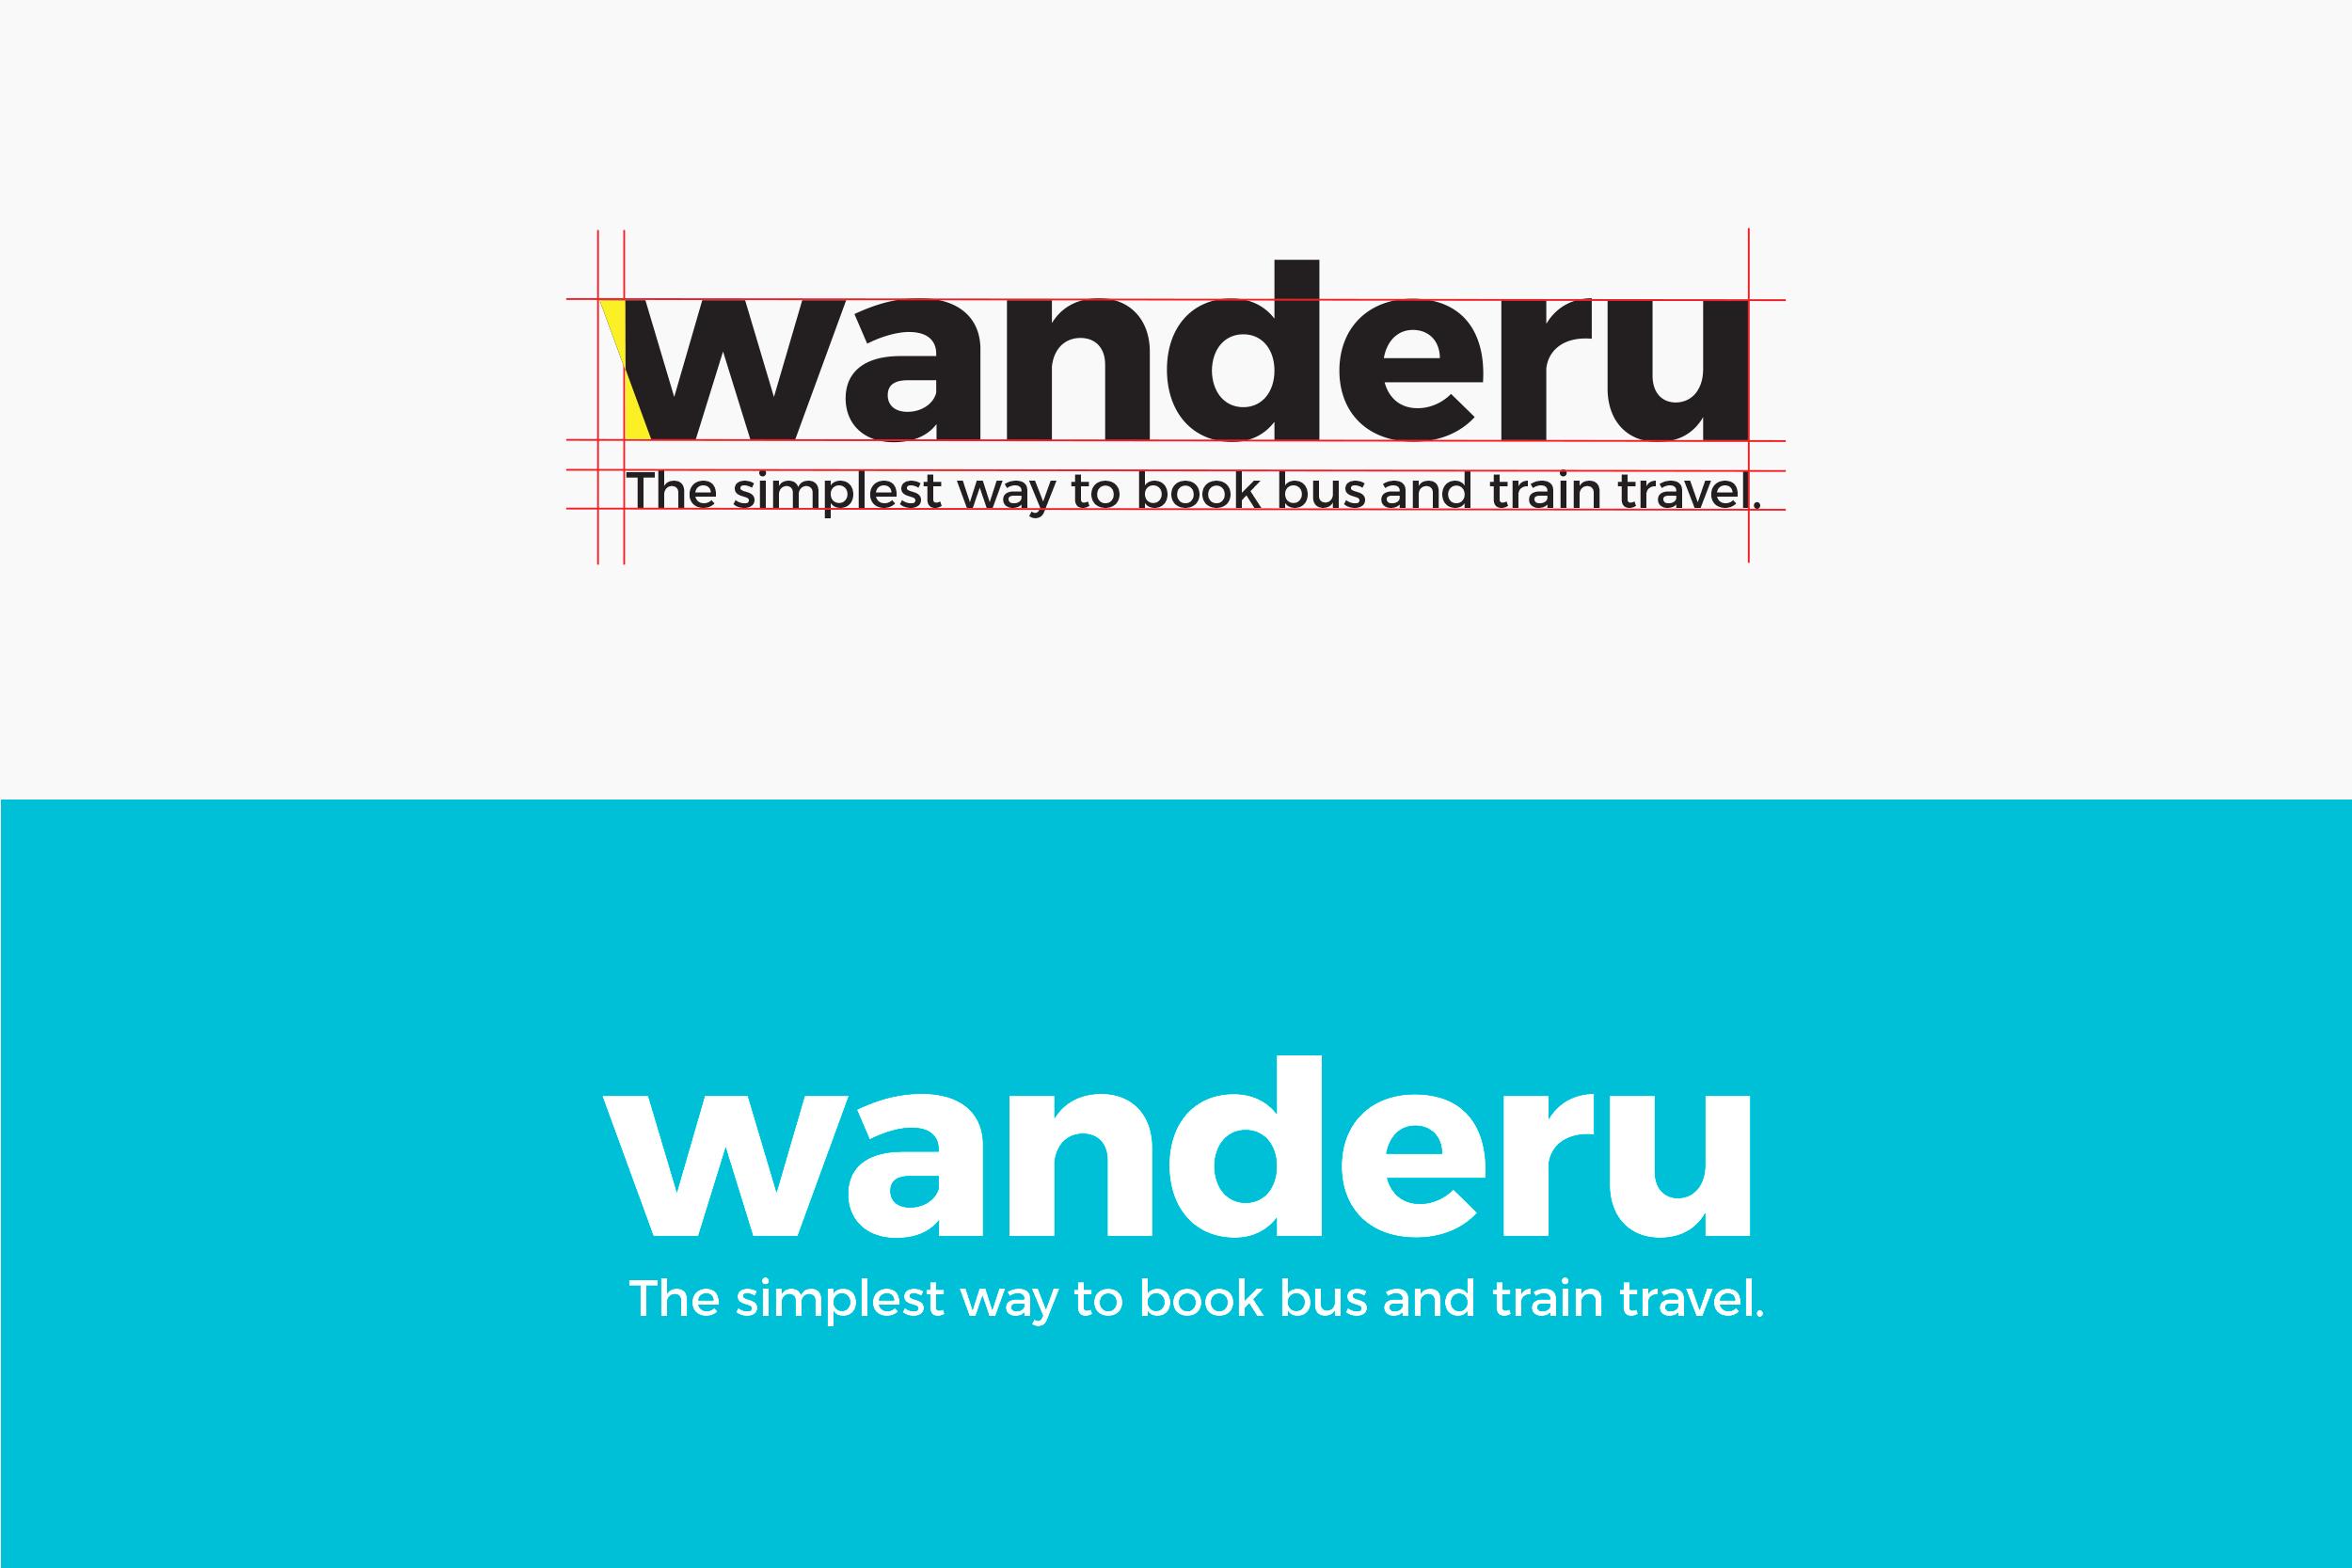 Wanderu logomark along with tagline